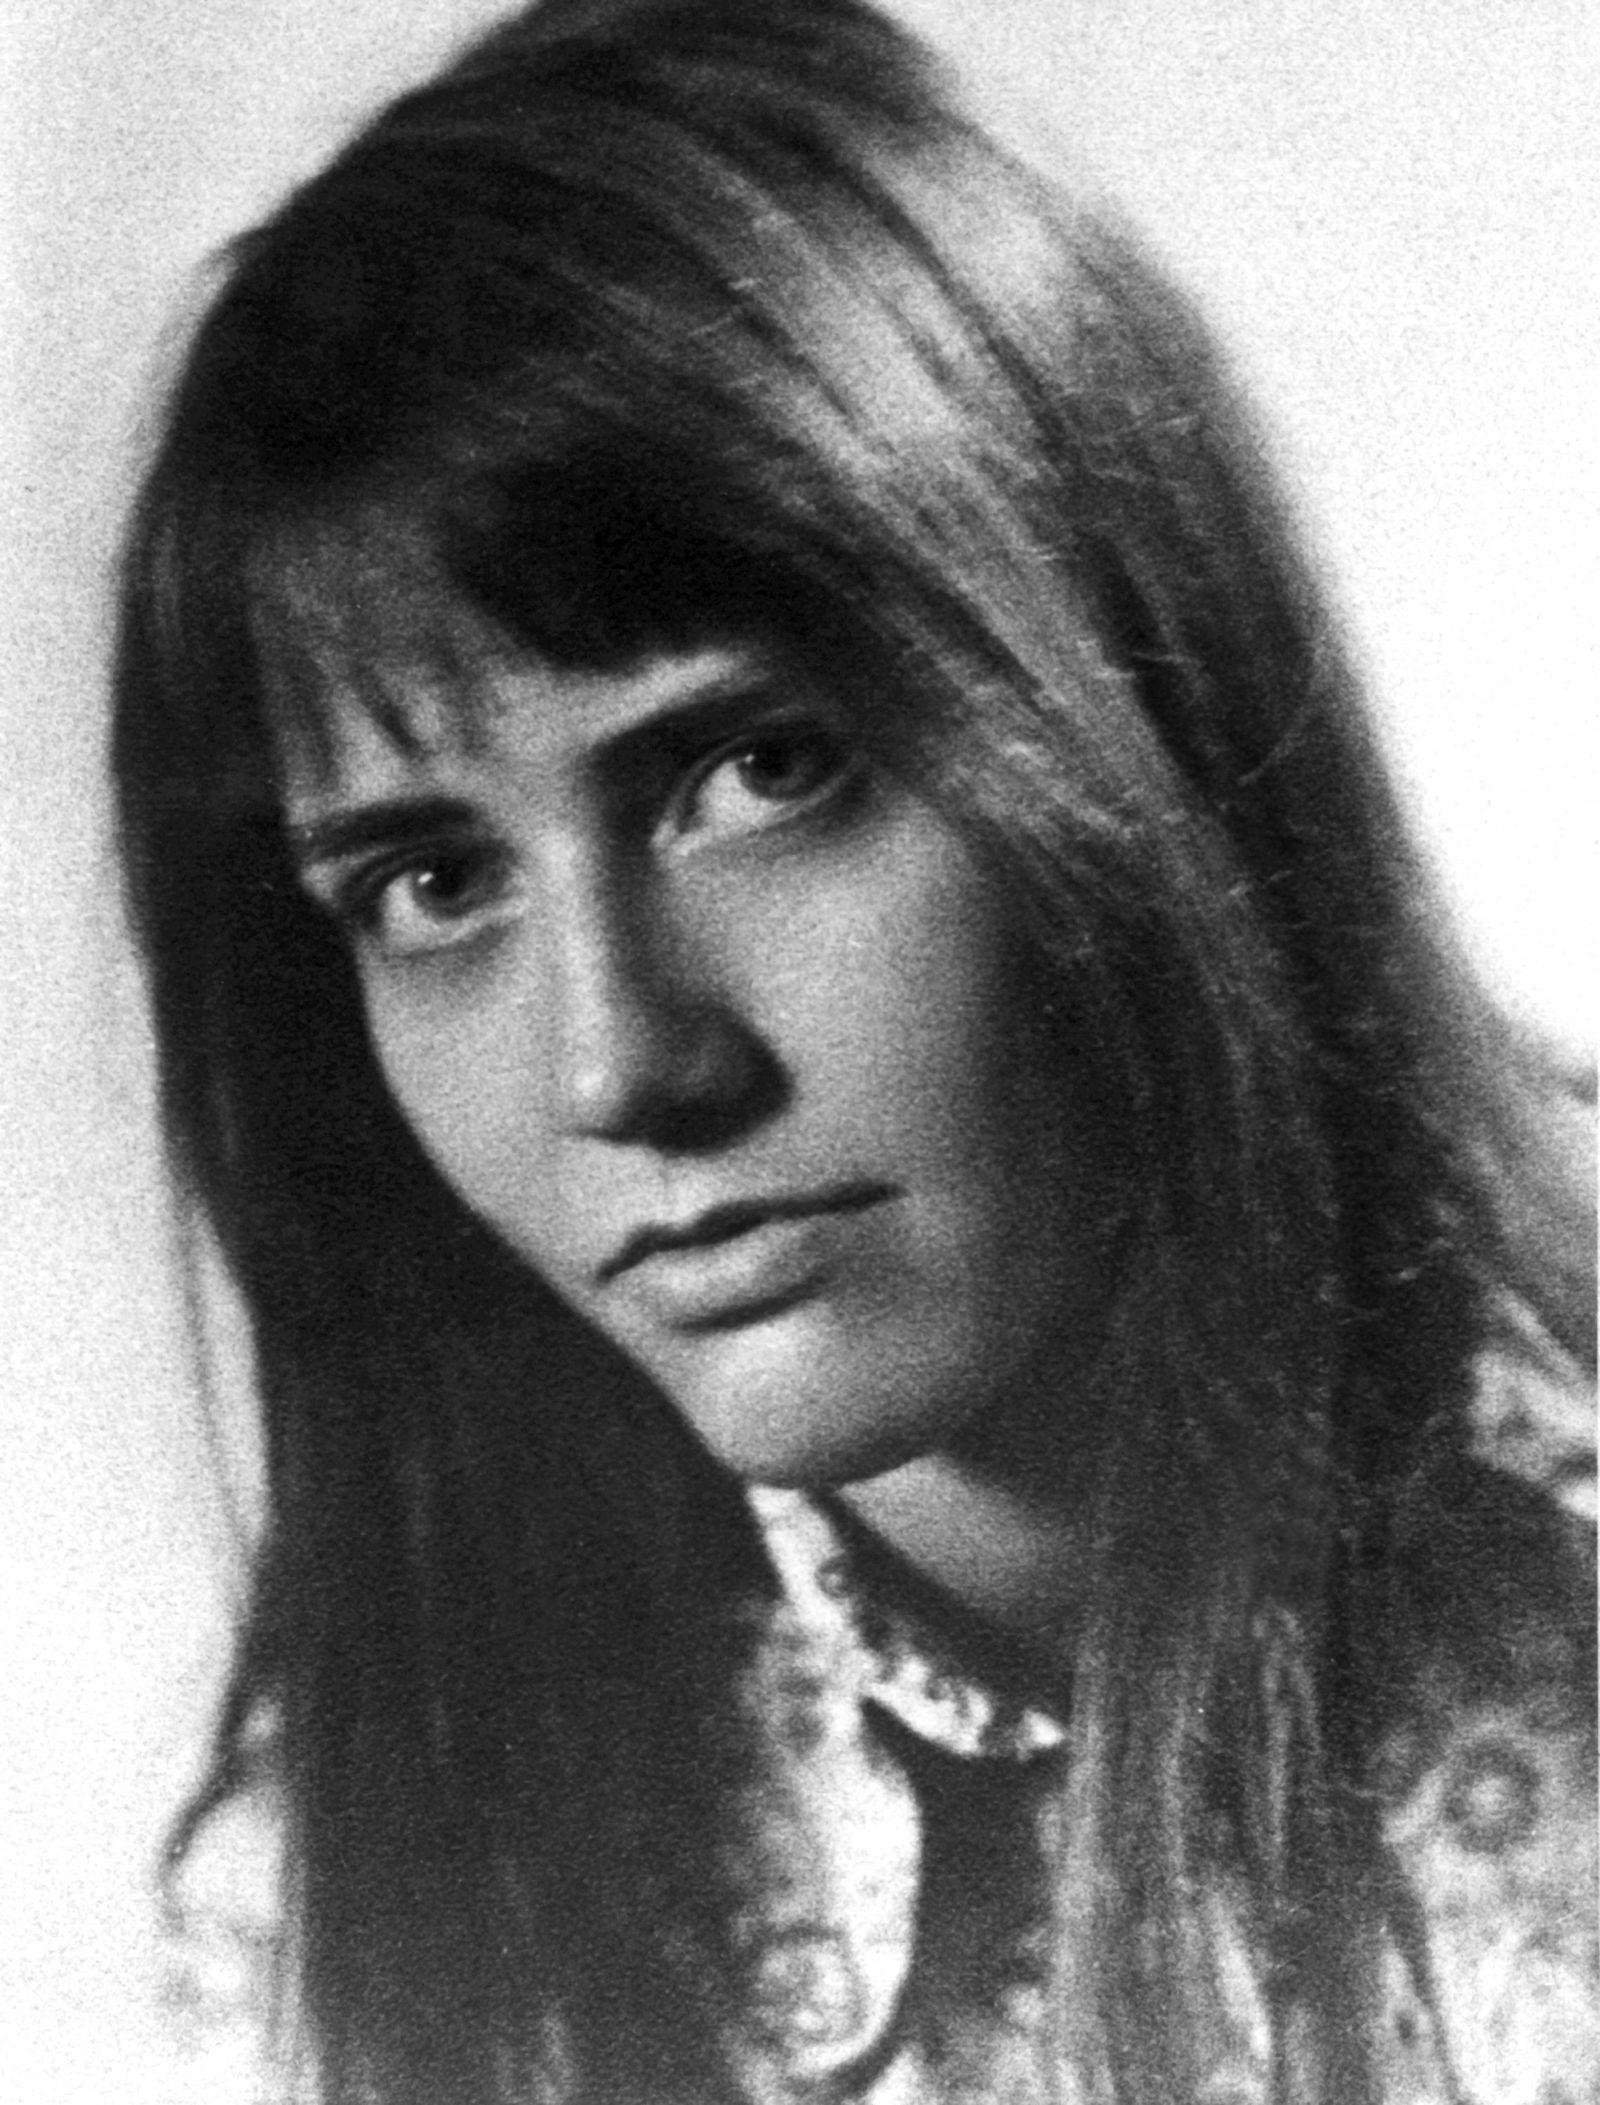 Elisabeth Käsemann